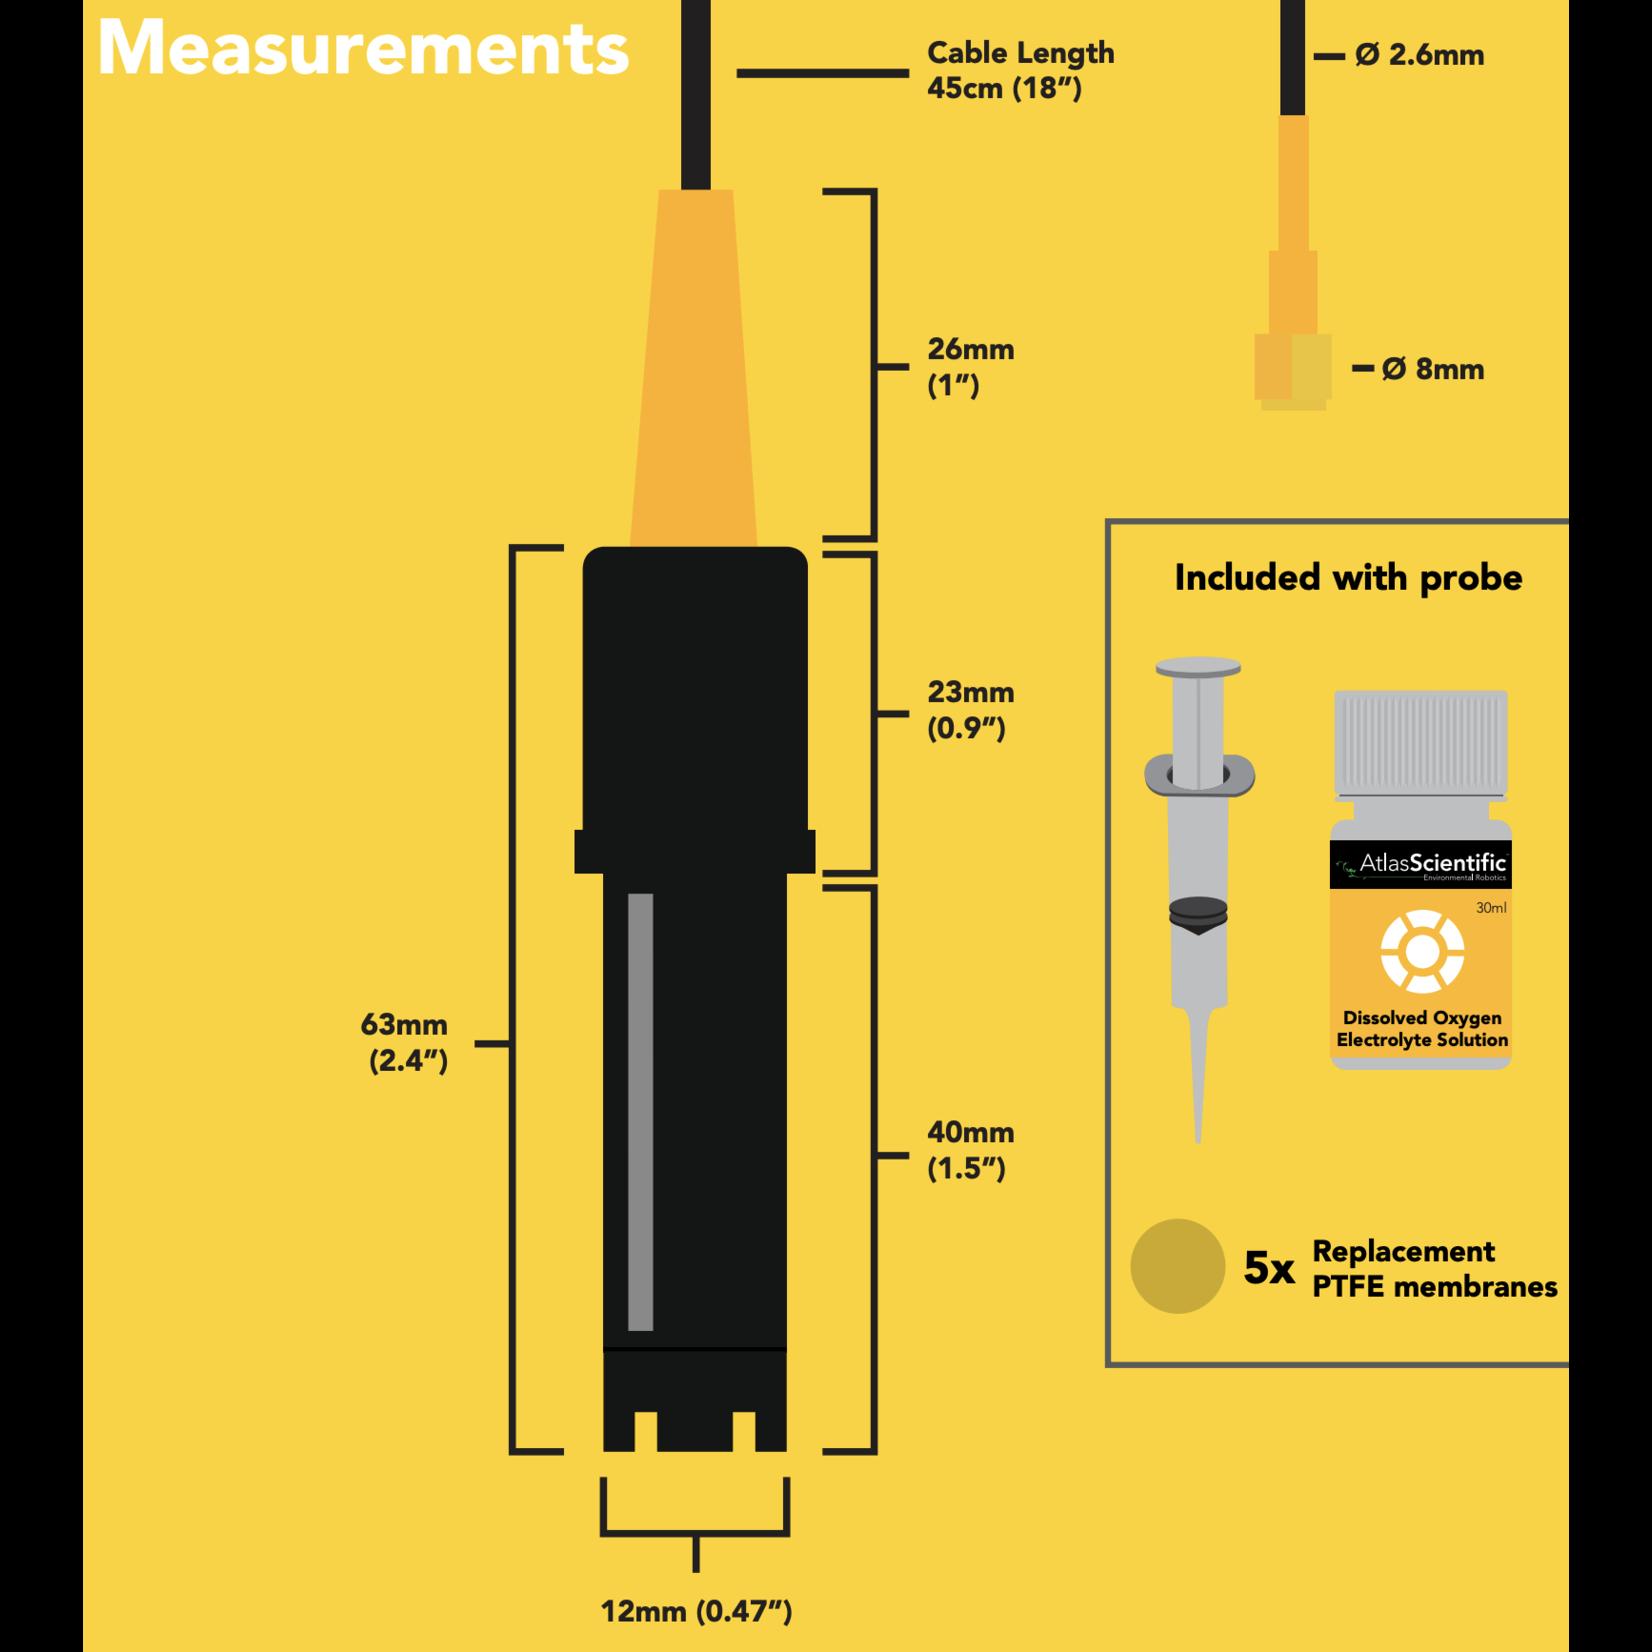 Atlas Scientific Mini Dissolved Oxygen Probe